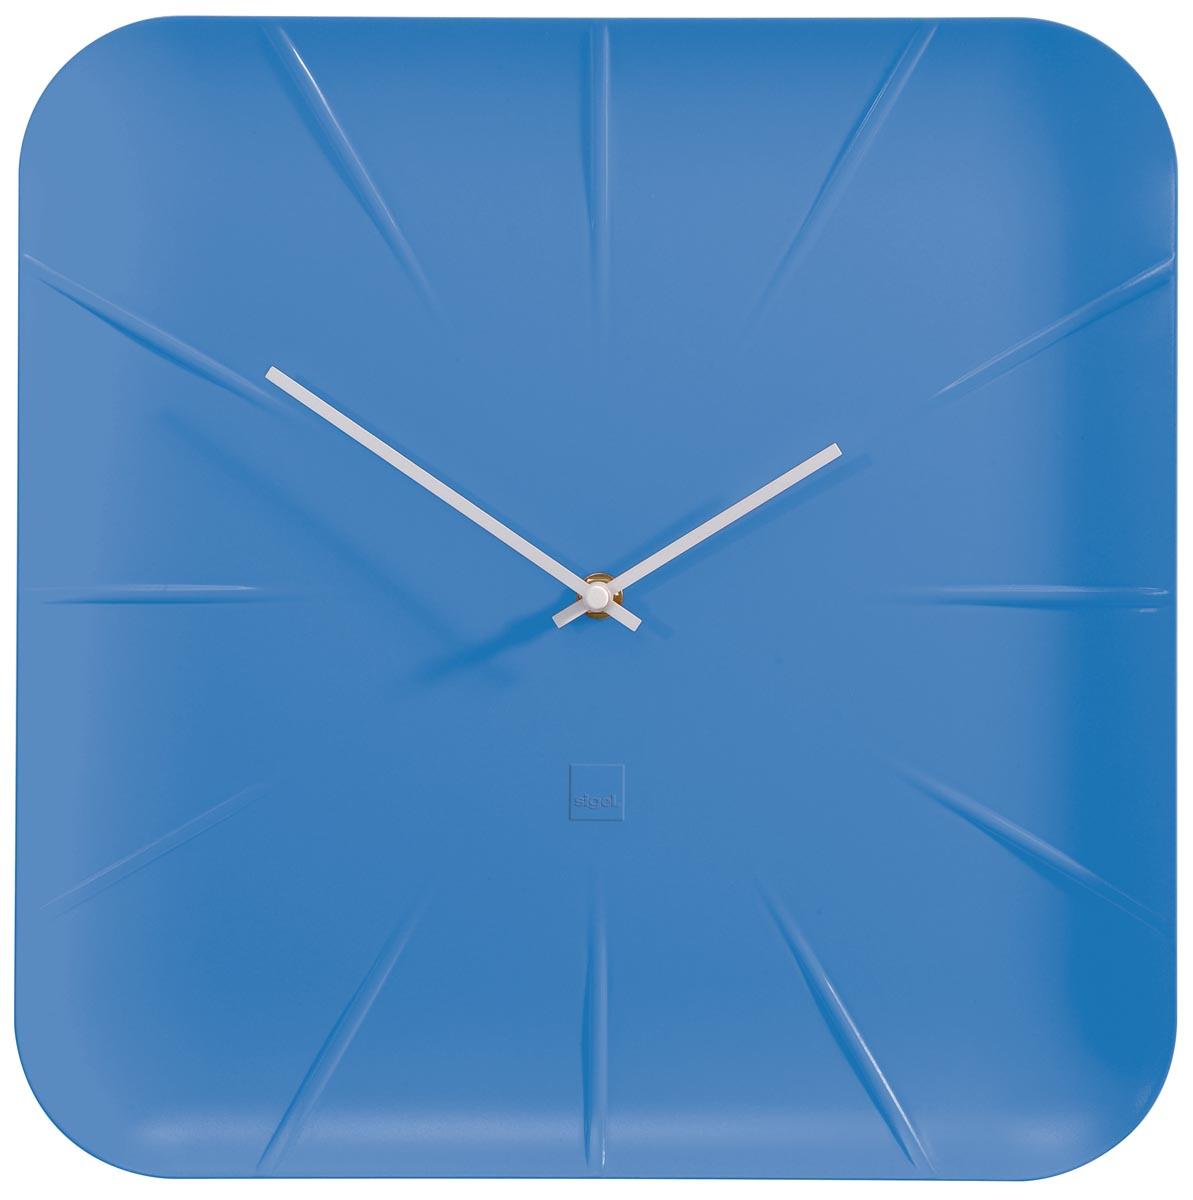 Sigel wandklok Inu, ft 35 x 35 x 4,5 cm, blauw